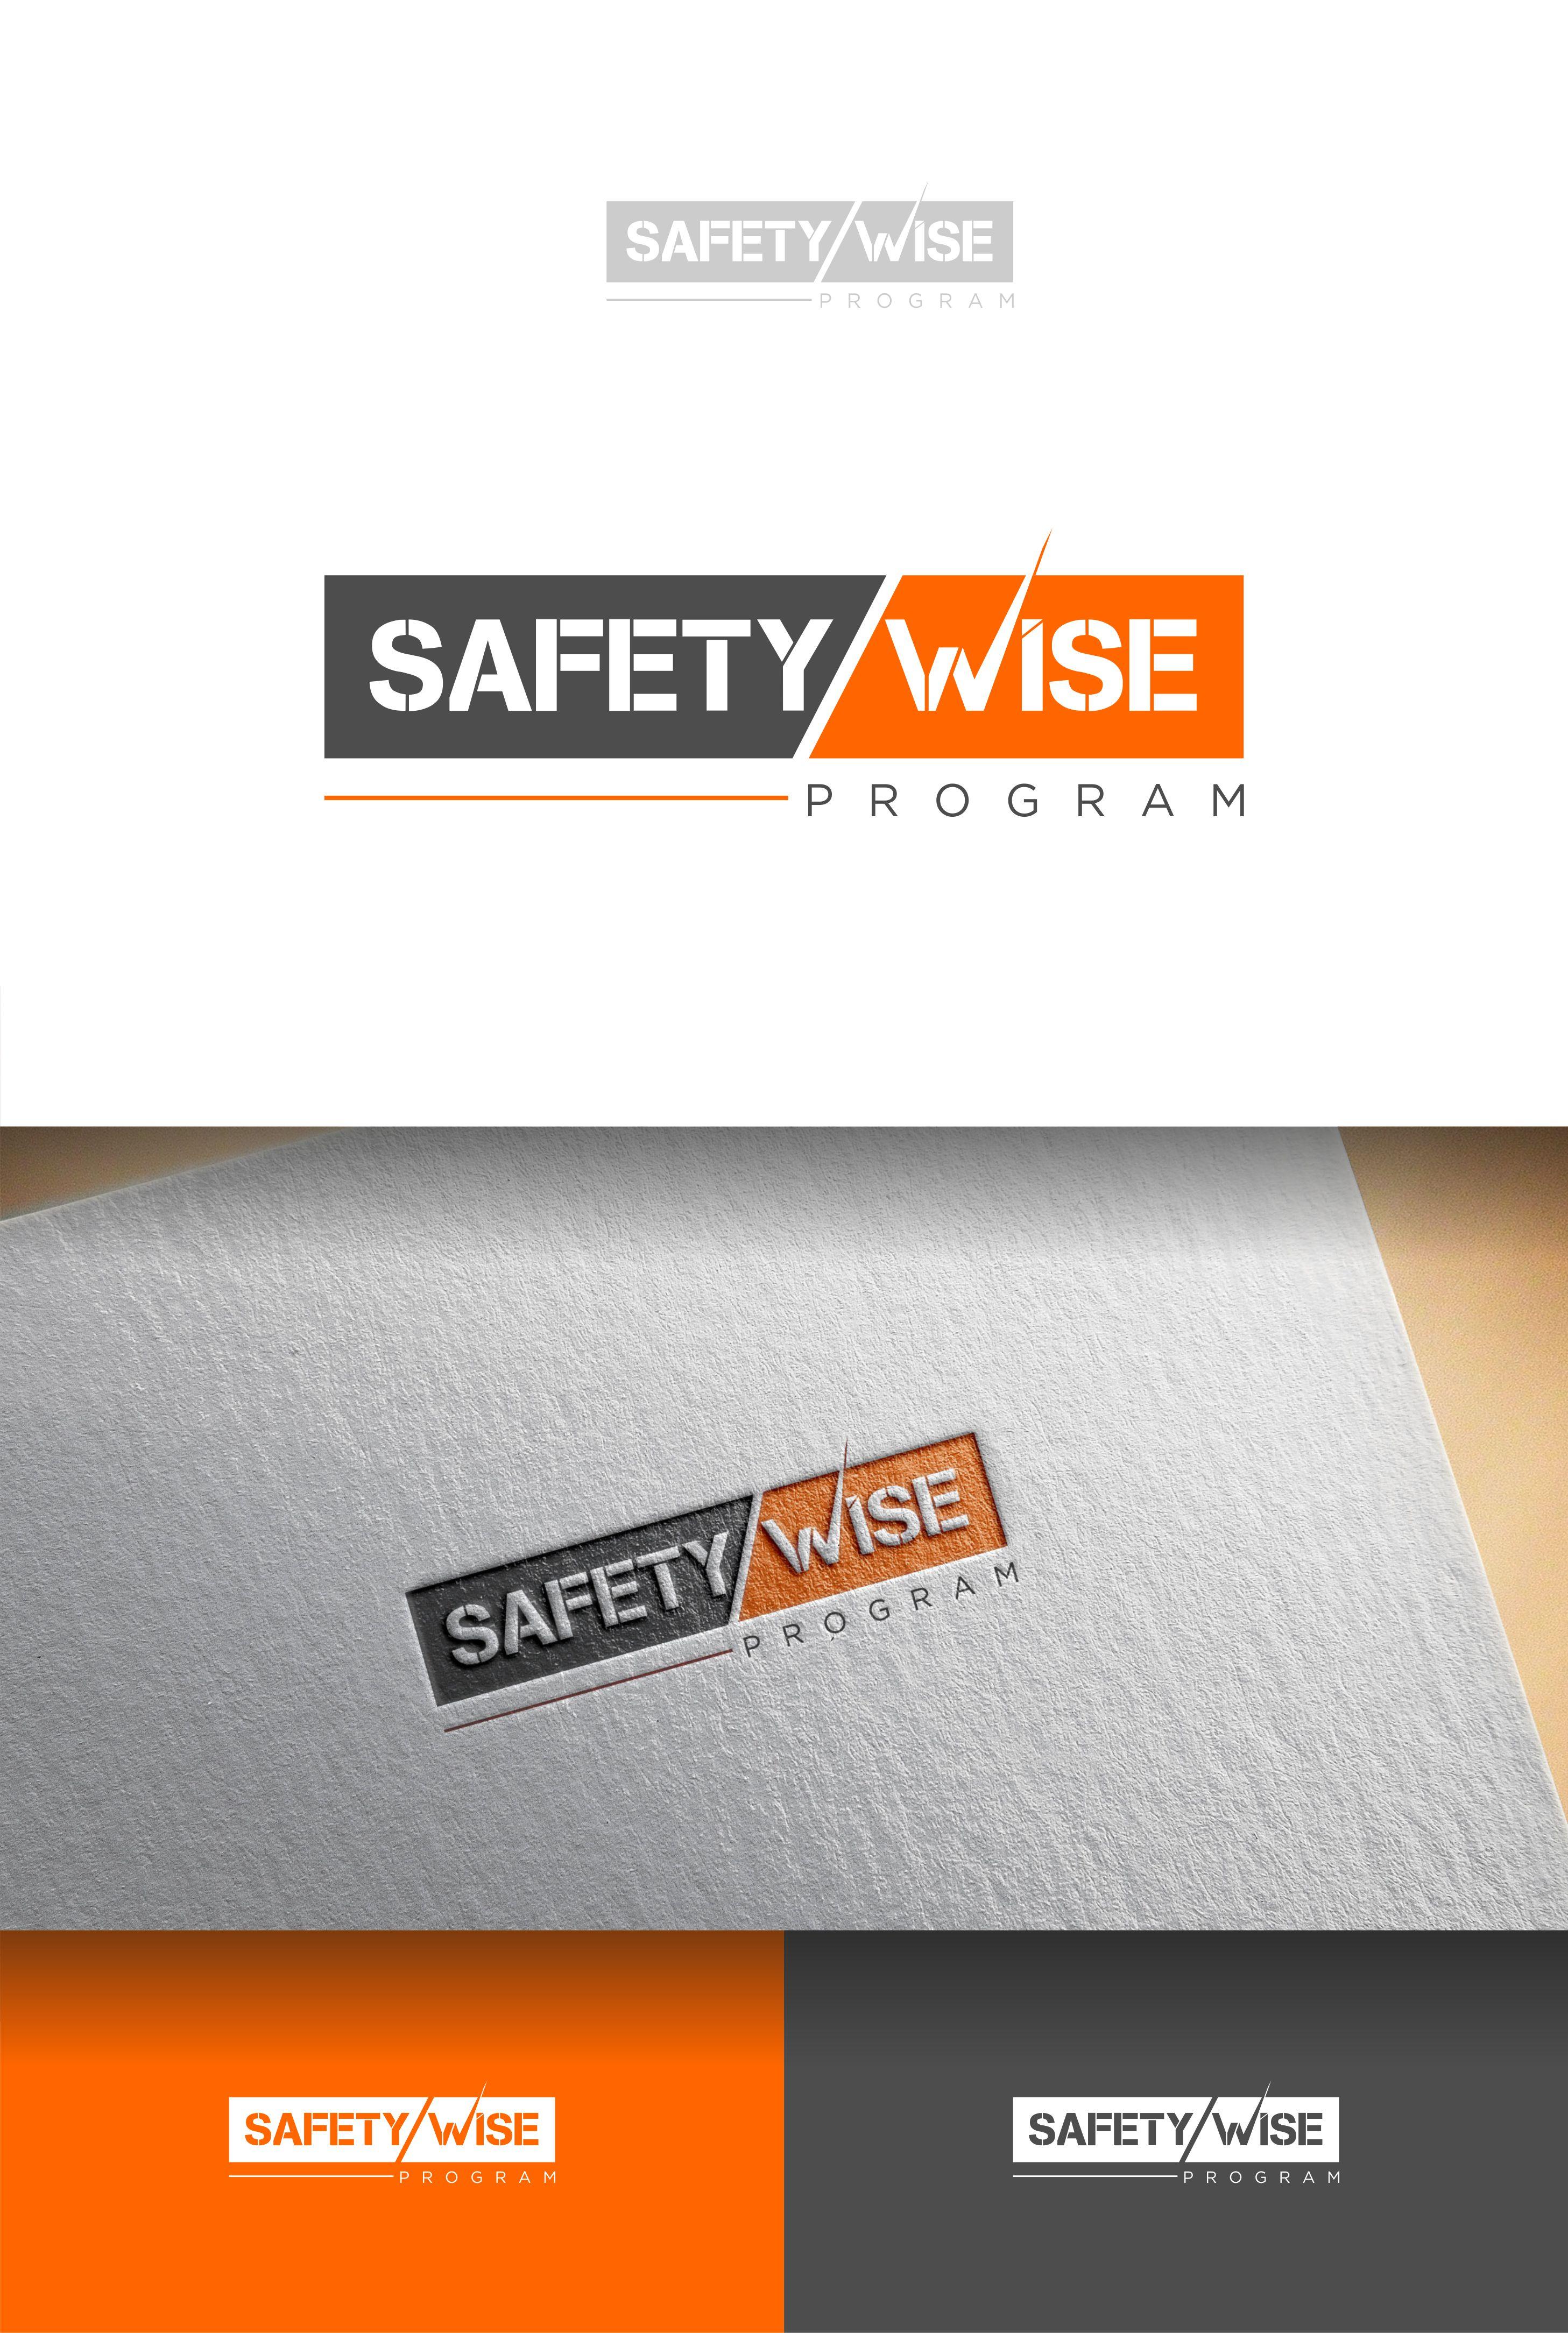 Logo Design by Raymond Garcia - Entry No. 142 in the Logo Design Contest New Logo Design for Safety Wise Program.